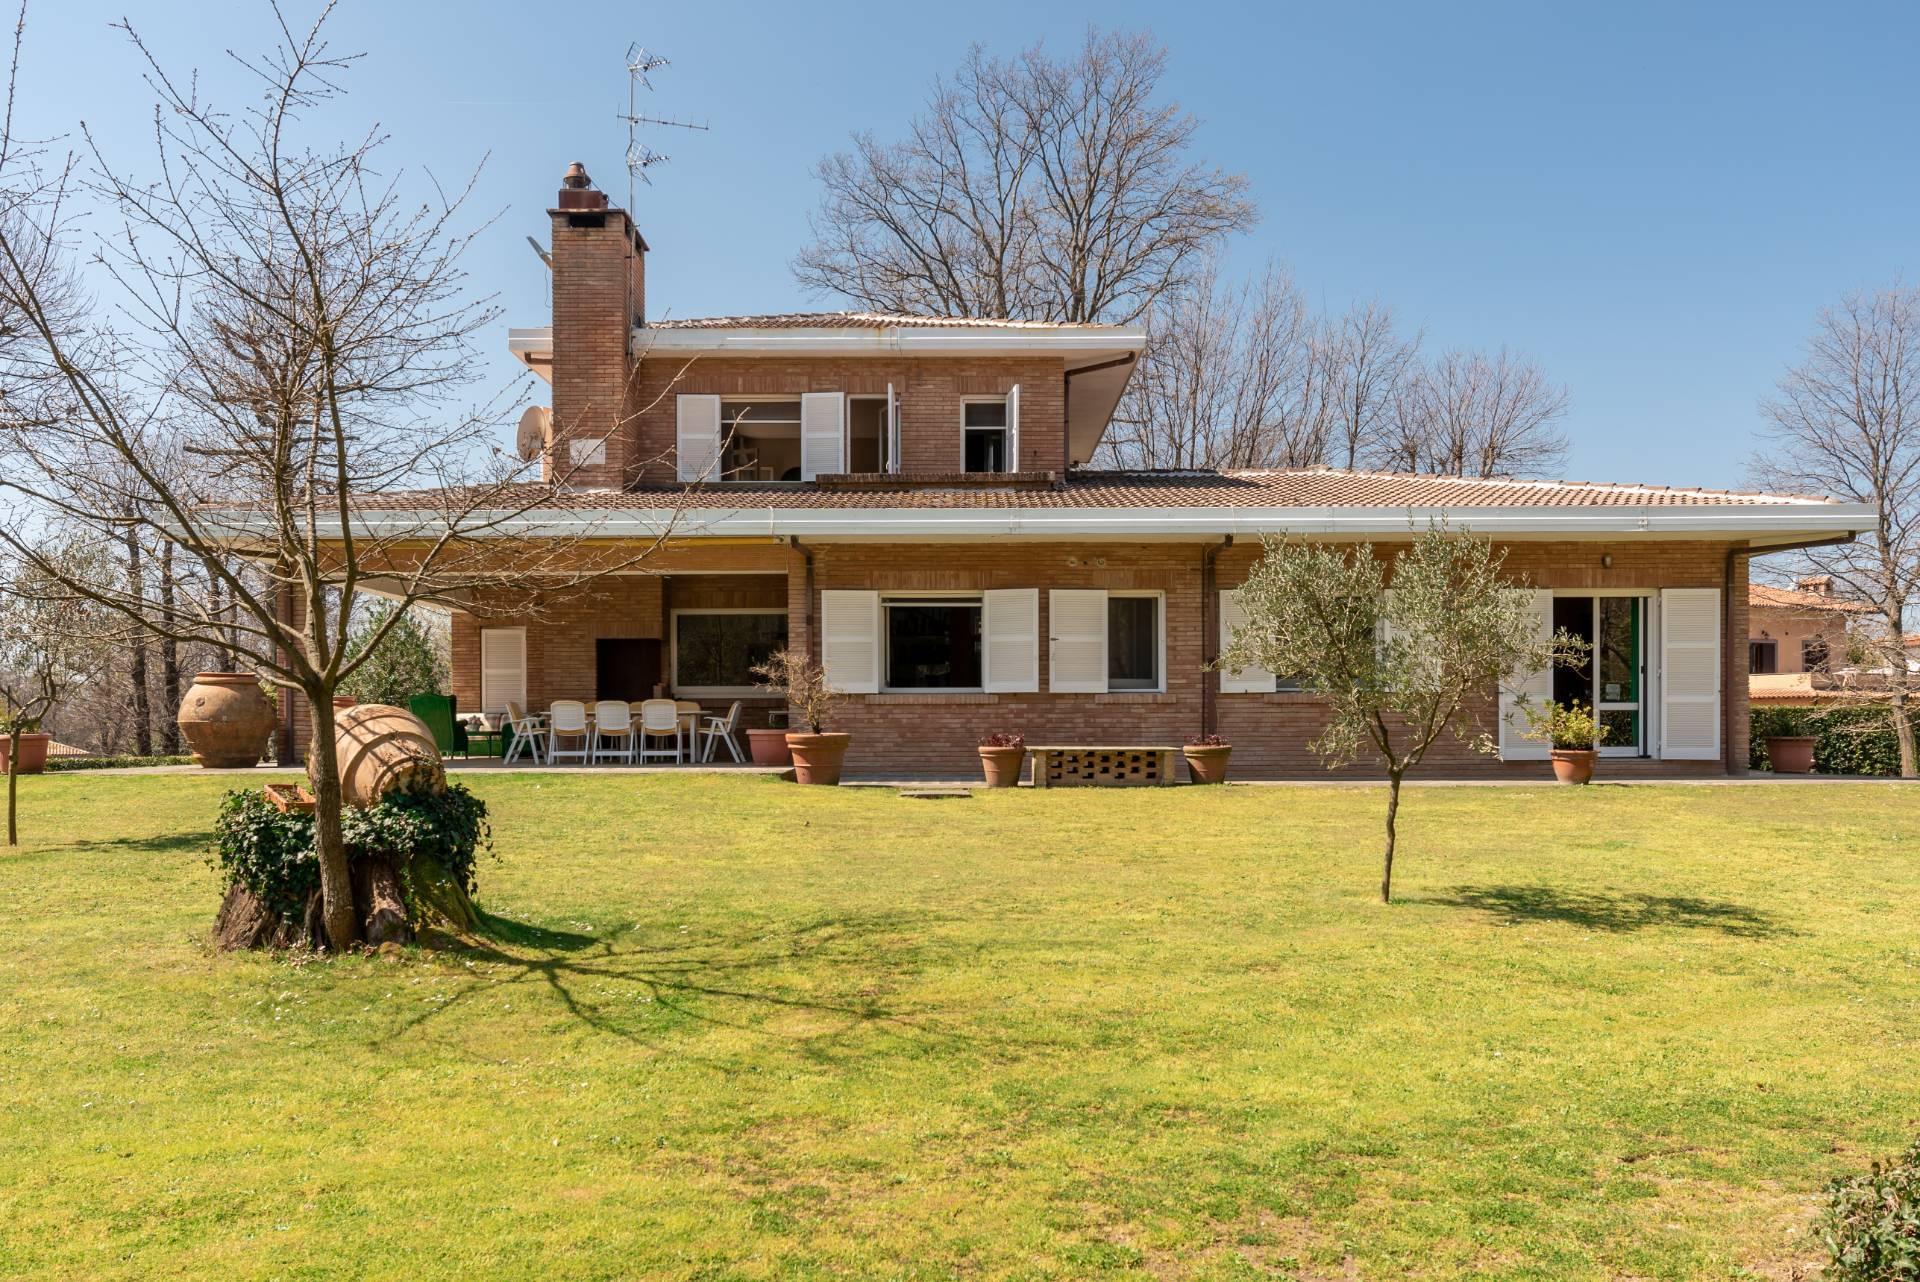 Villa in Vendita a Ariccia: 5 locali, 583 mq - Foto 14